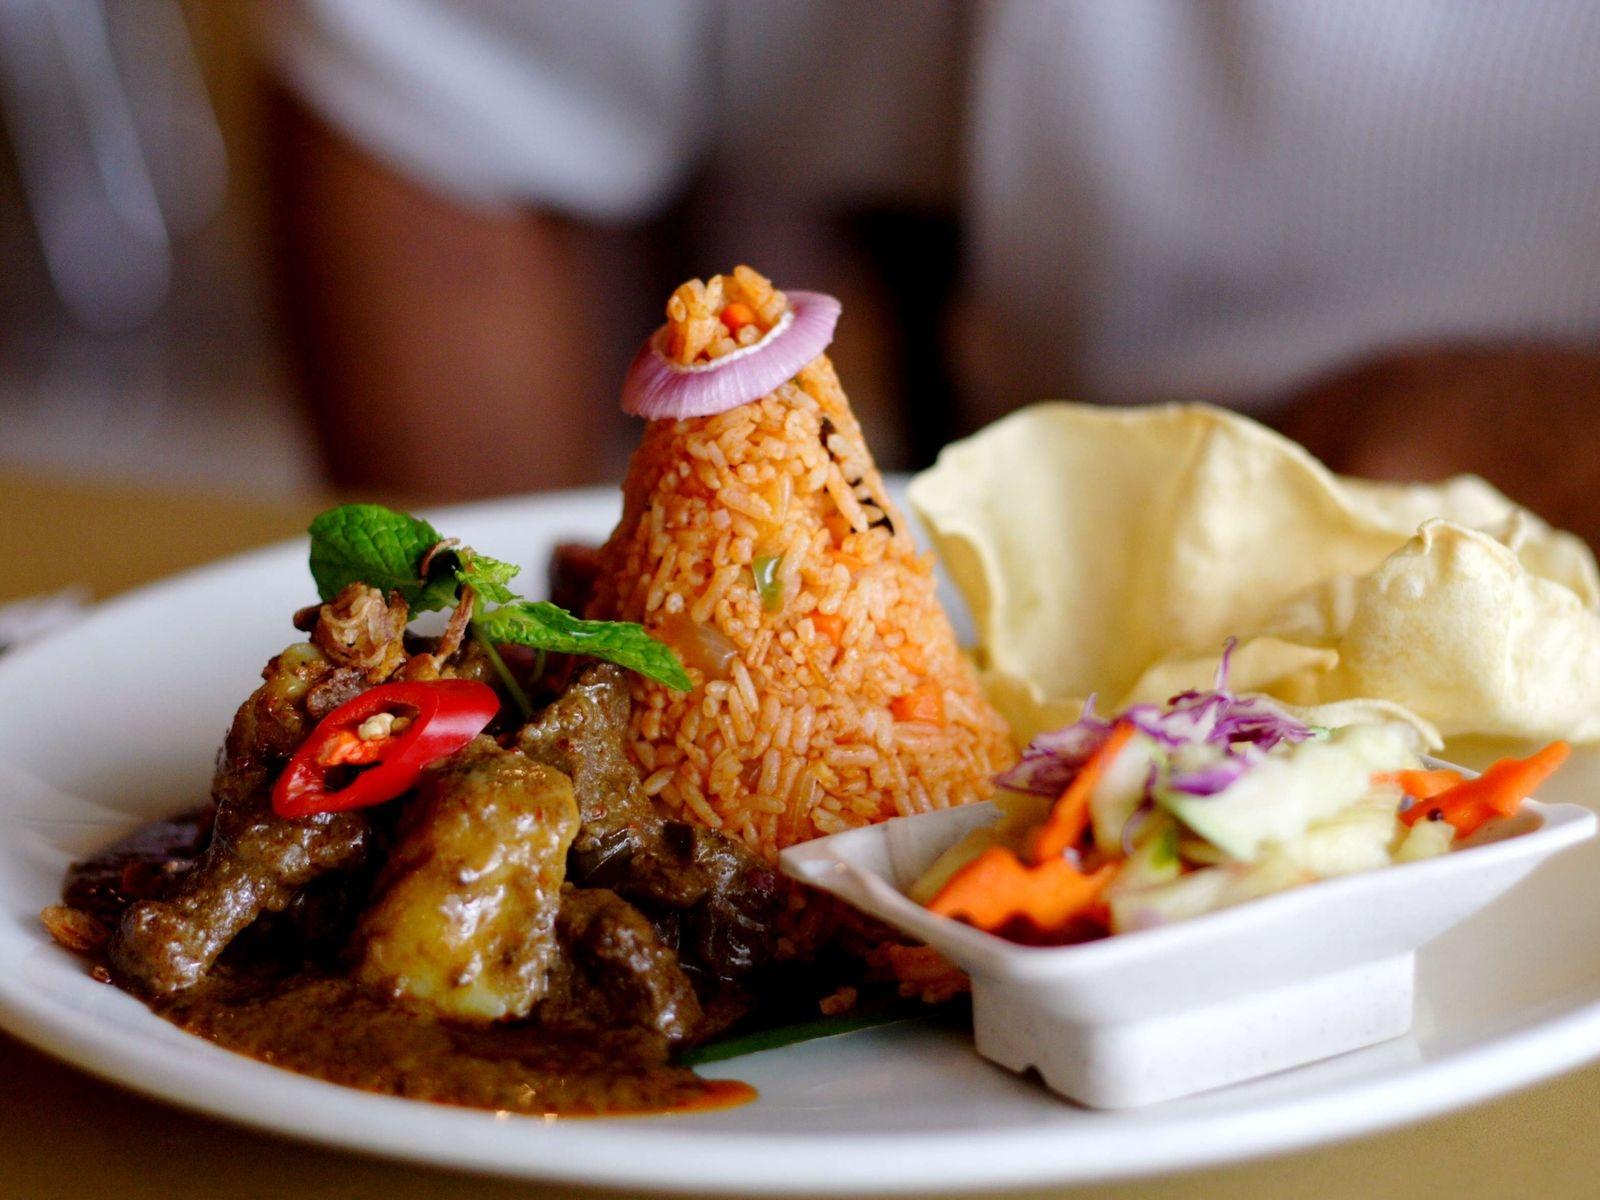 Wallpaper Meat Vegetables Seafood Rice Dinner Meal